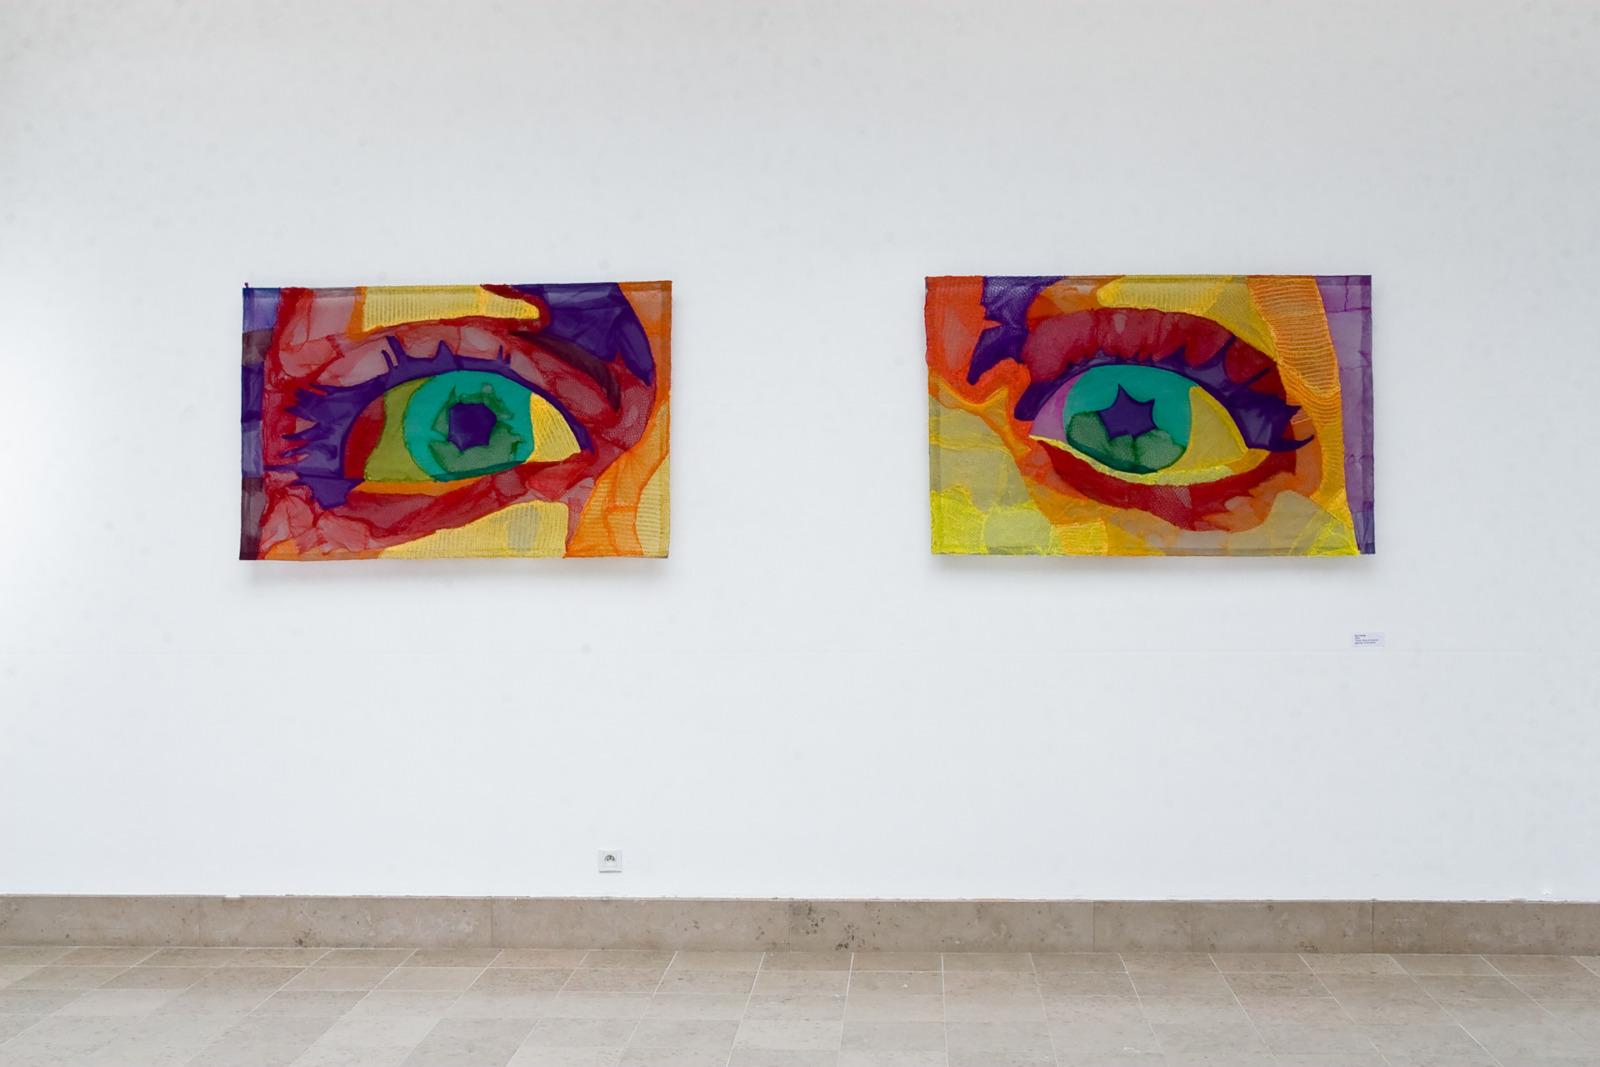 Eye Candy, 2009, Fruit Nets and monofilament, 147 cm x 93 cm x 1 cm x 2 elements